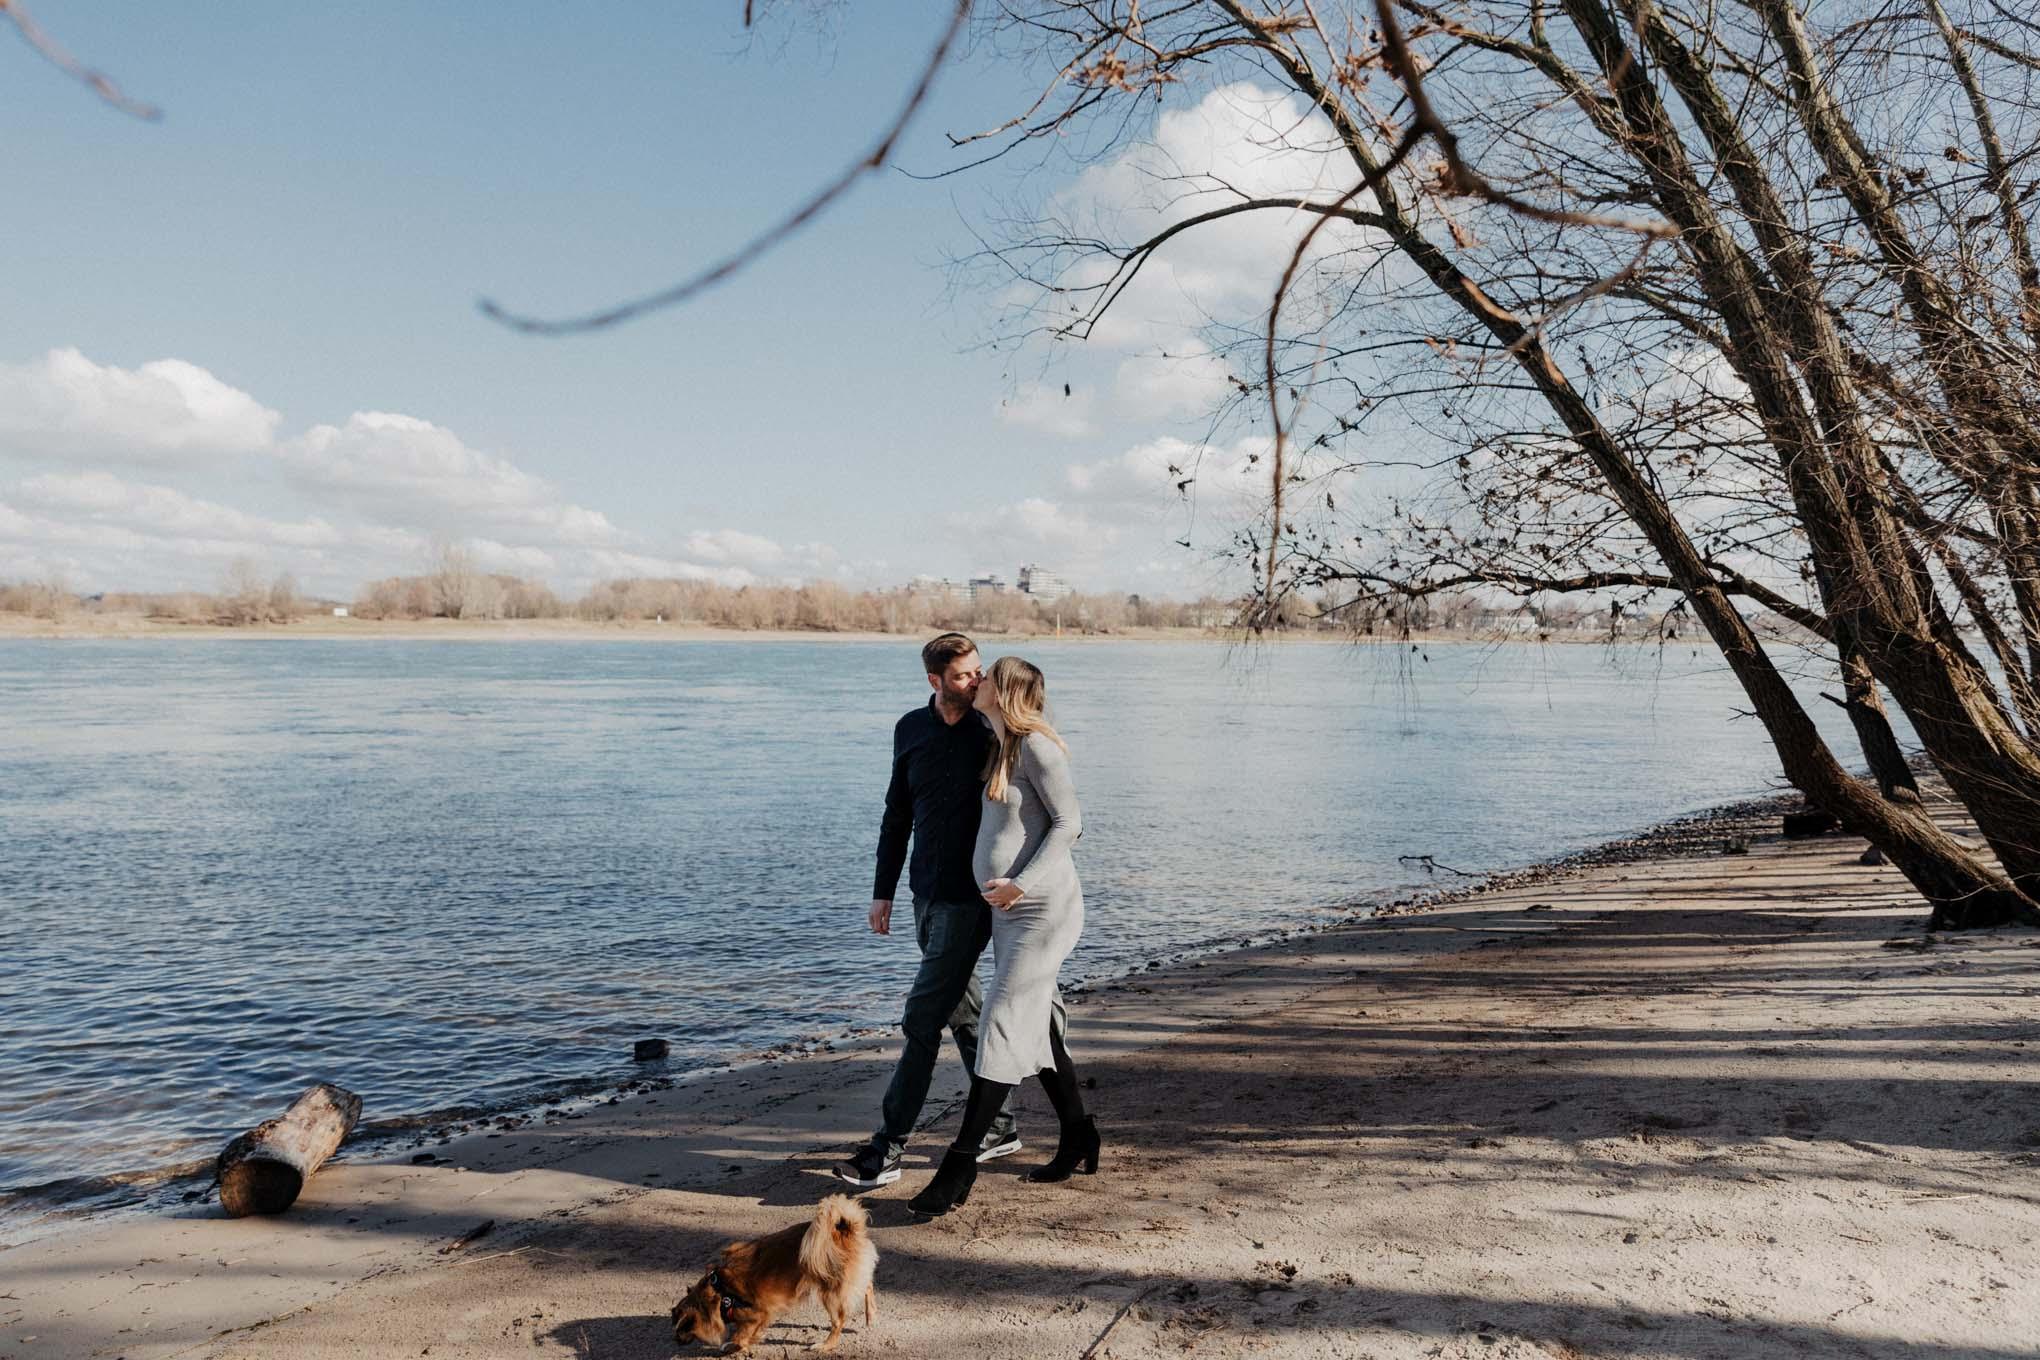 Familienfotos am Rheinufer in Koeln